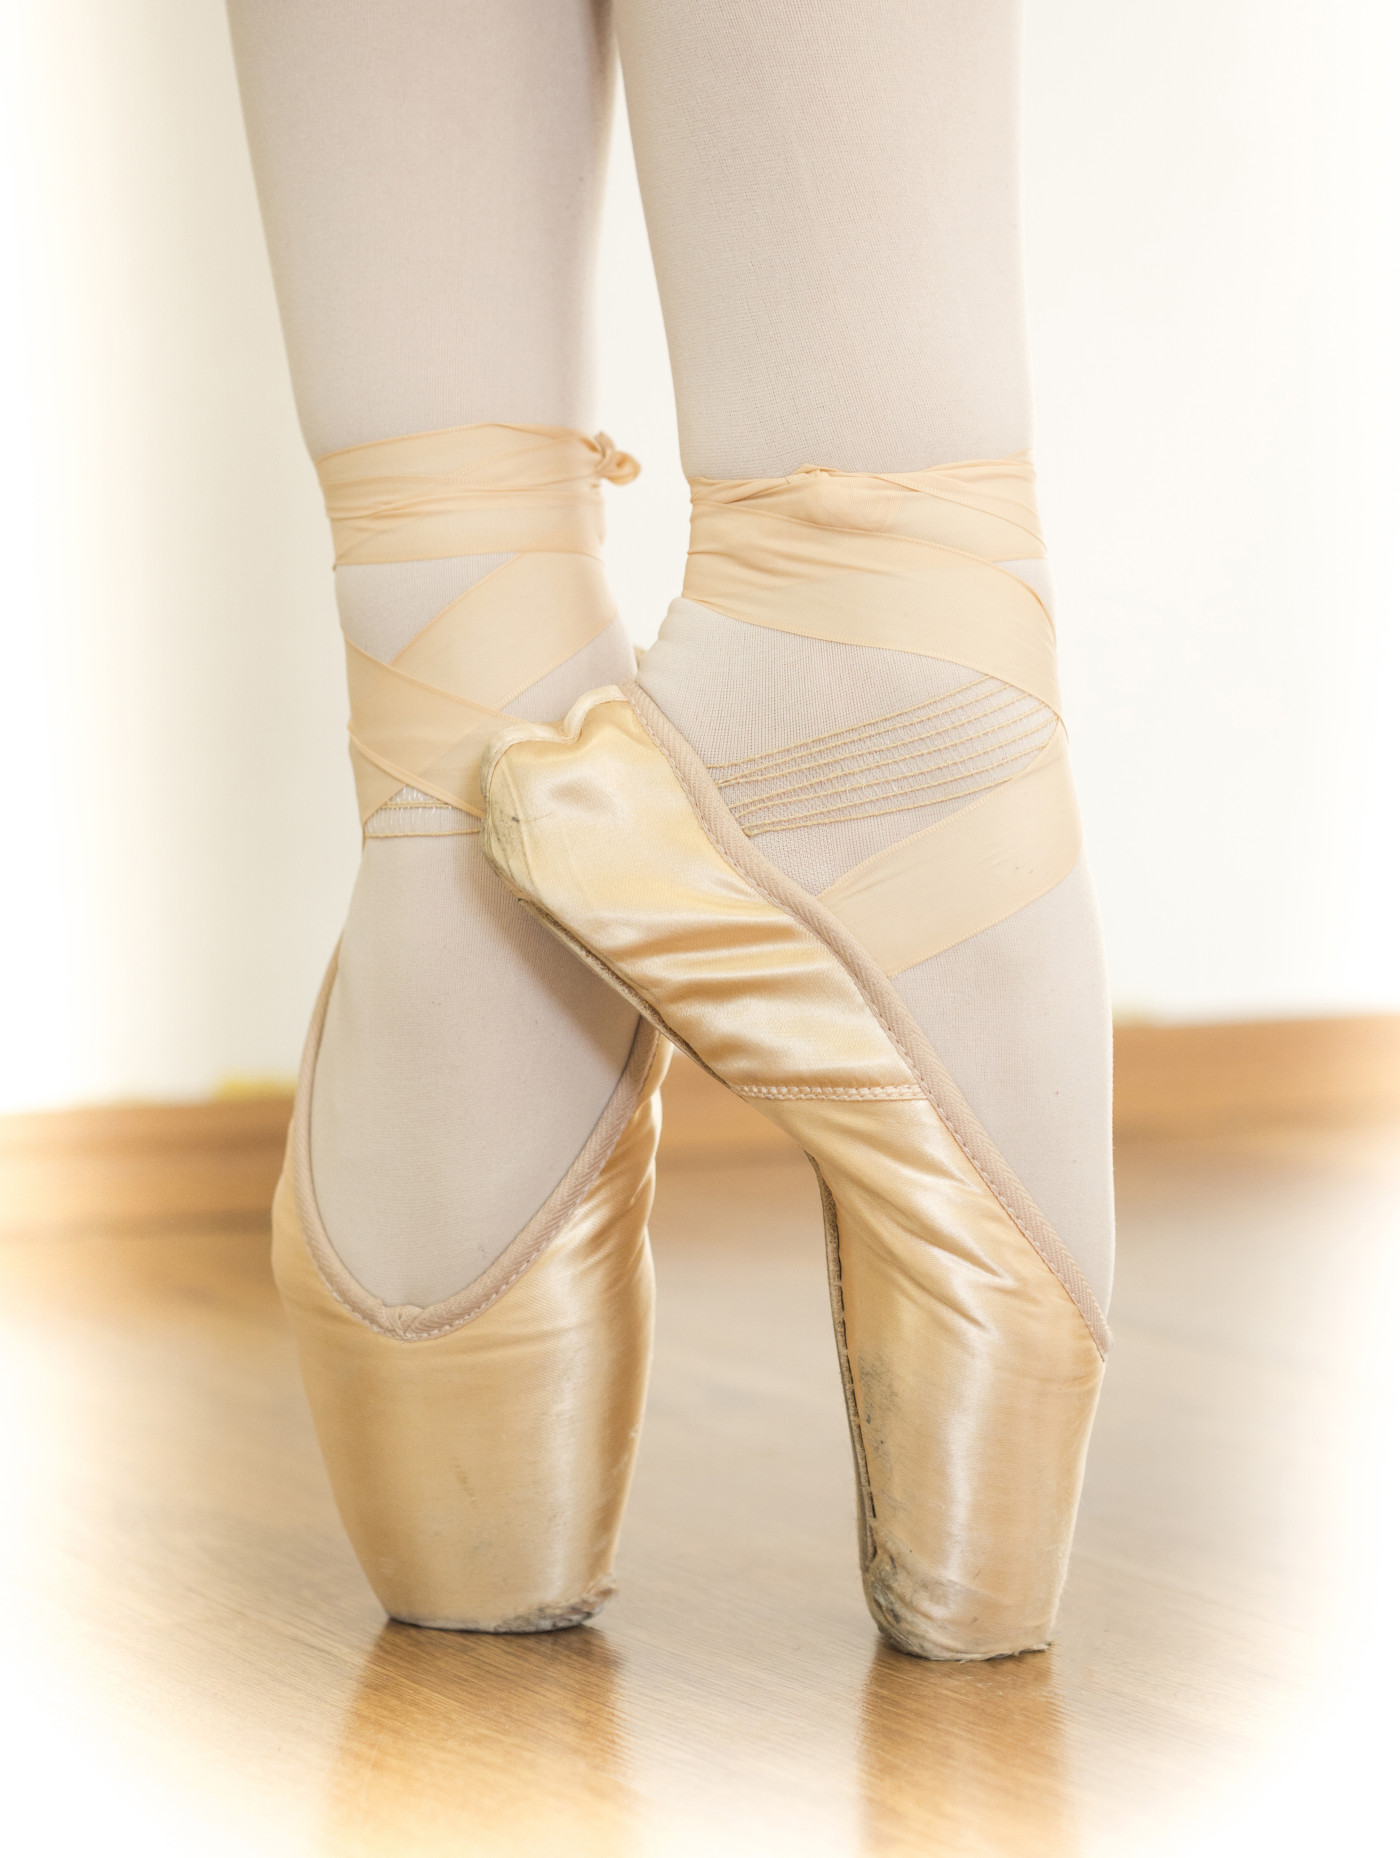 Ballerina doing pointe work